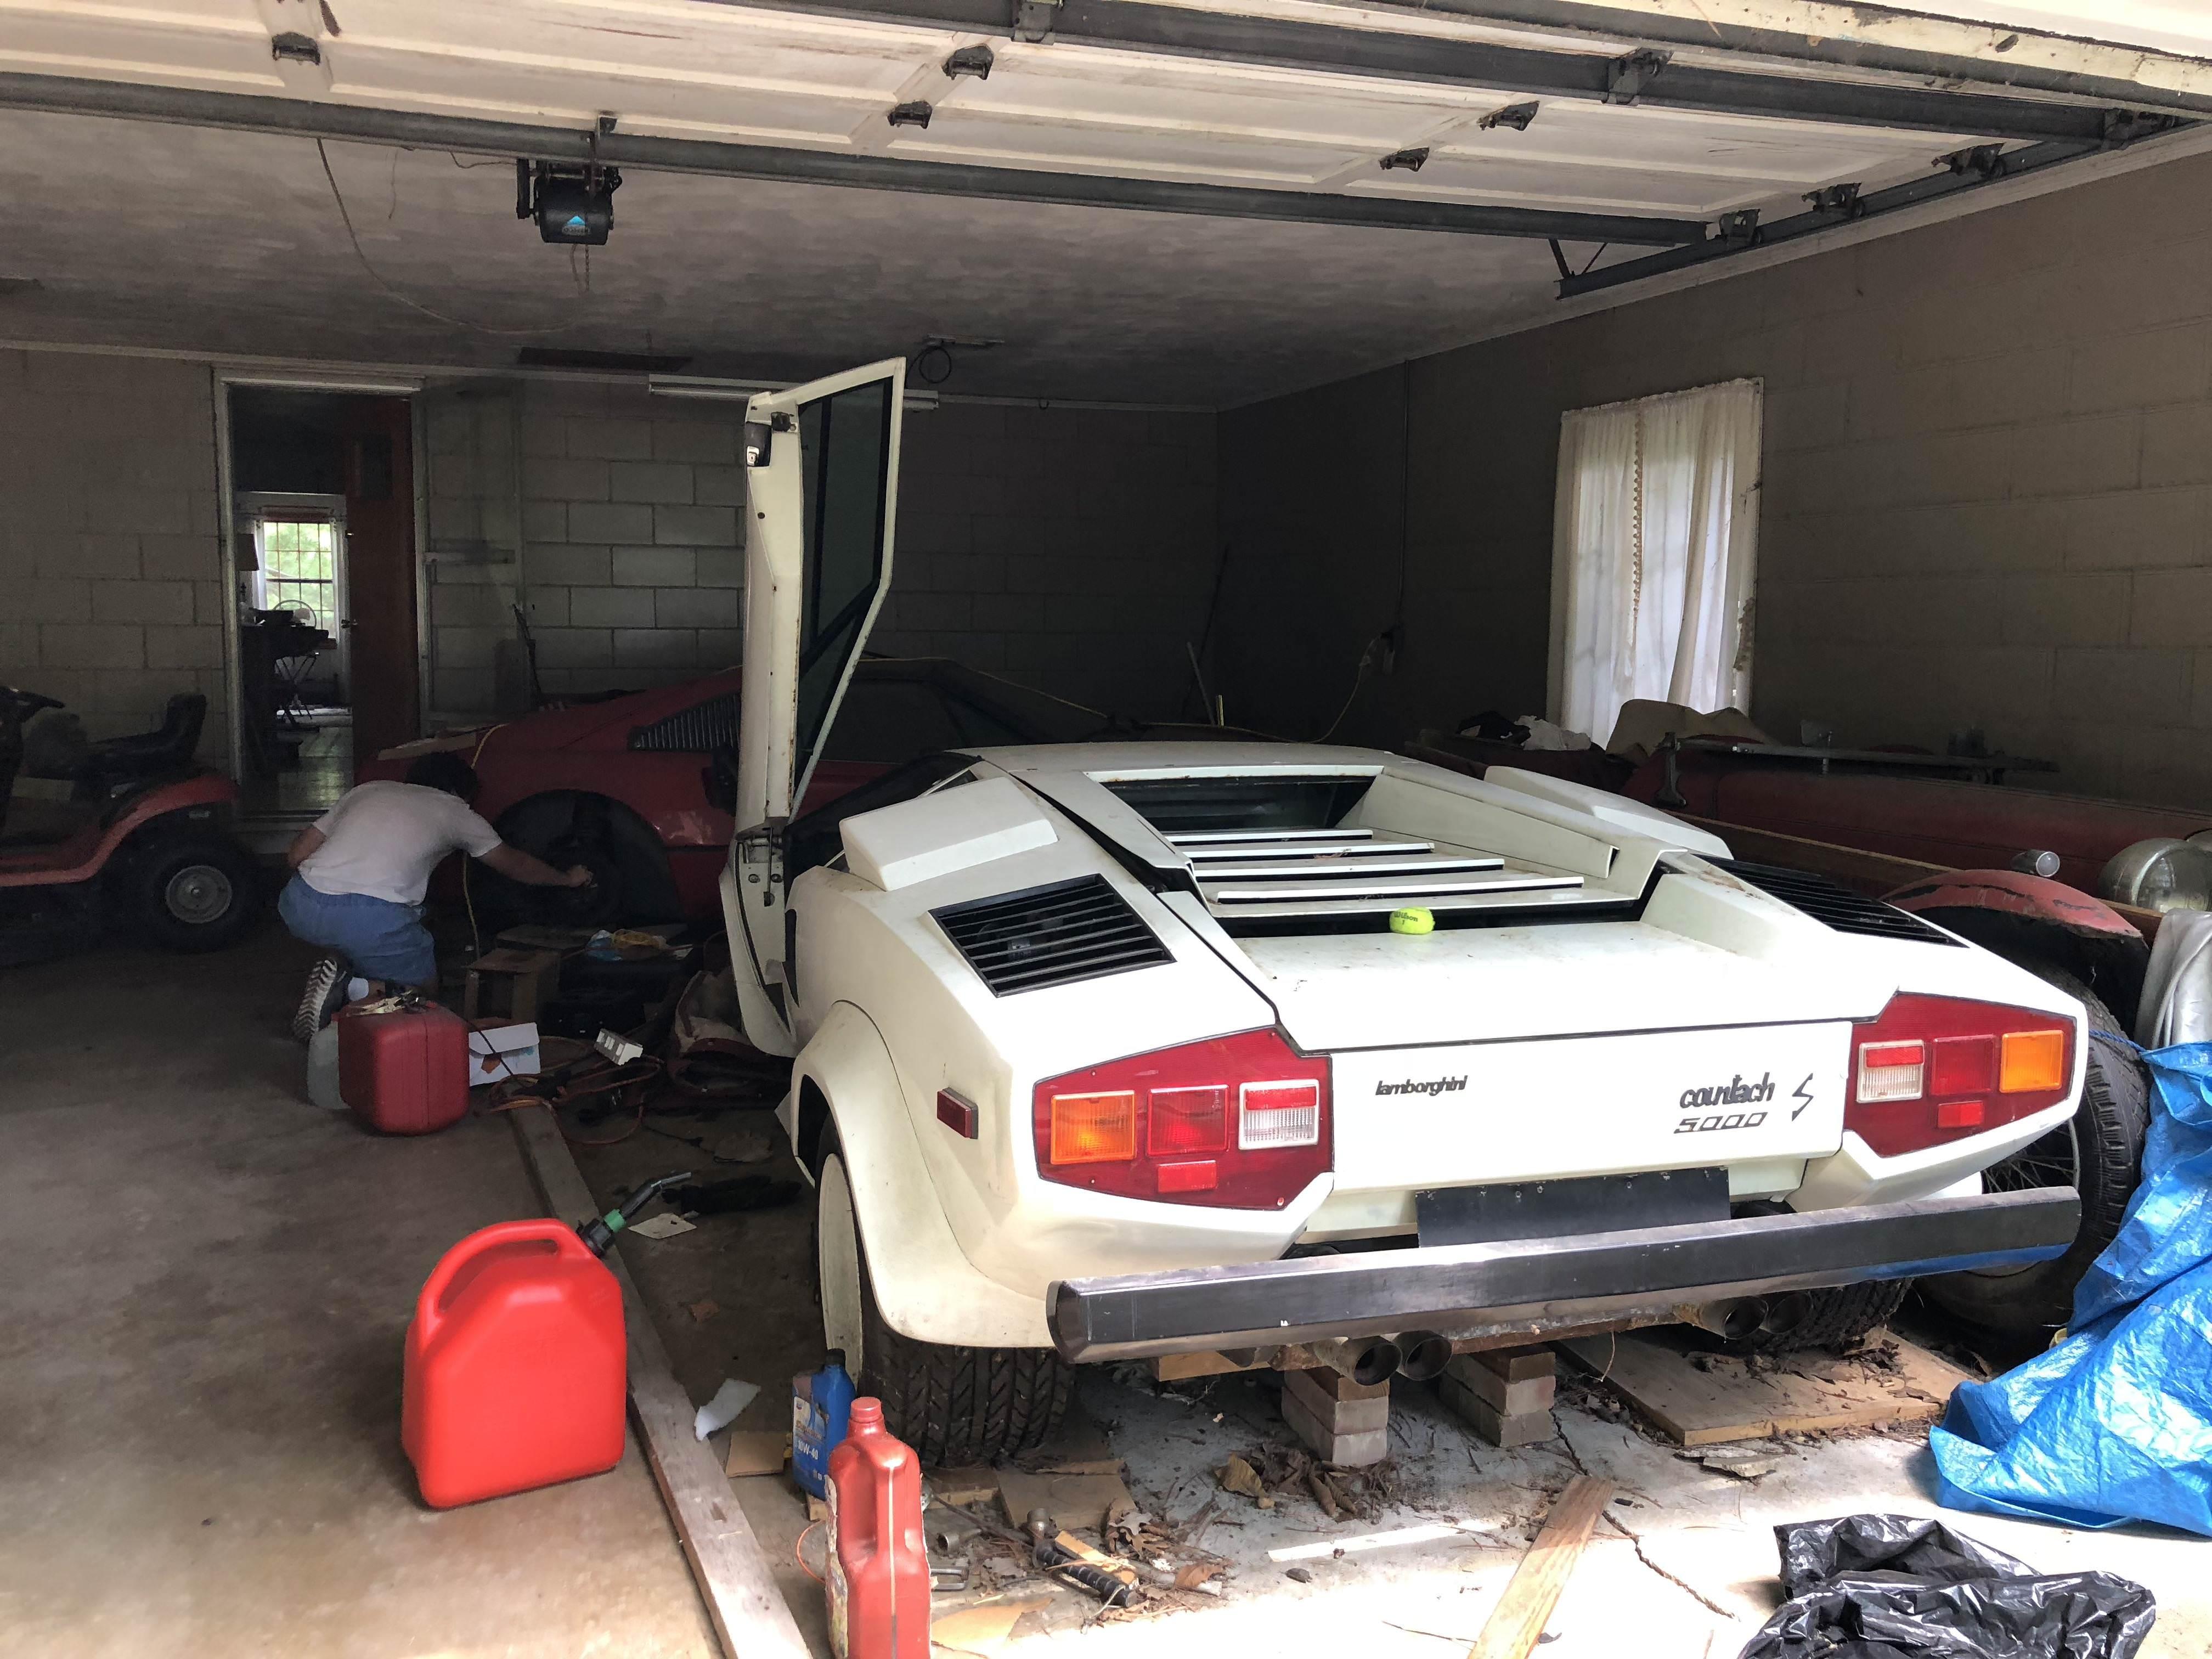 Lamborghini Countach and Ferrari 308 barnfind 5